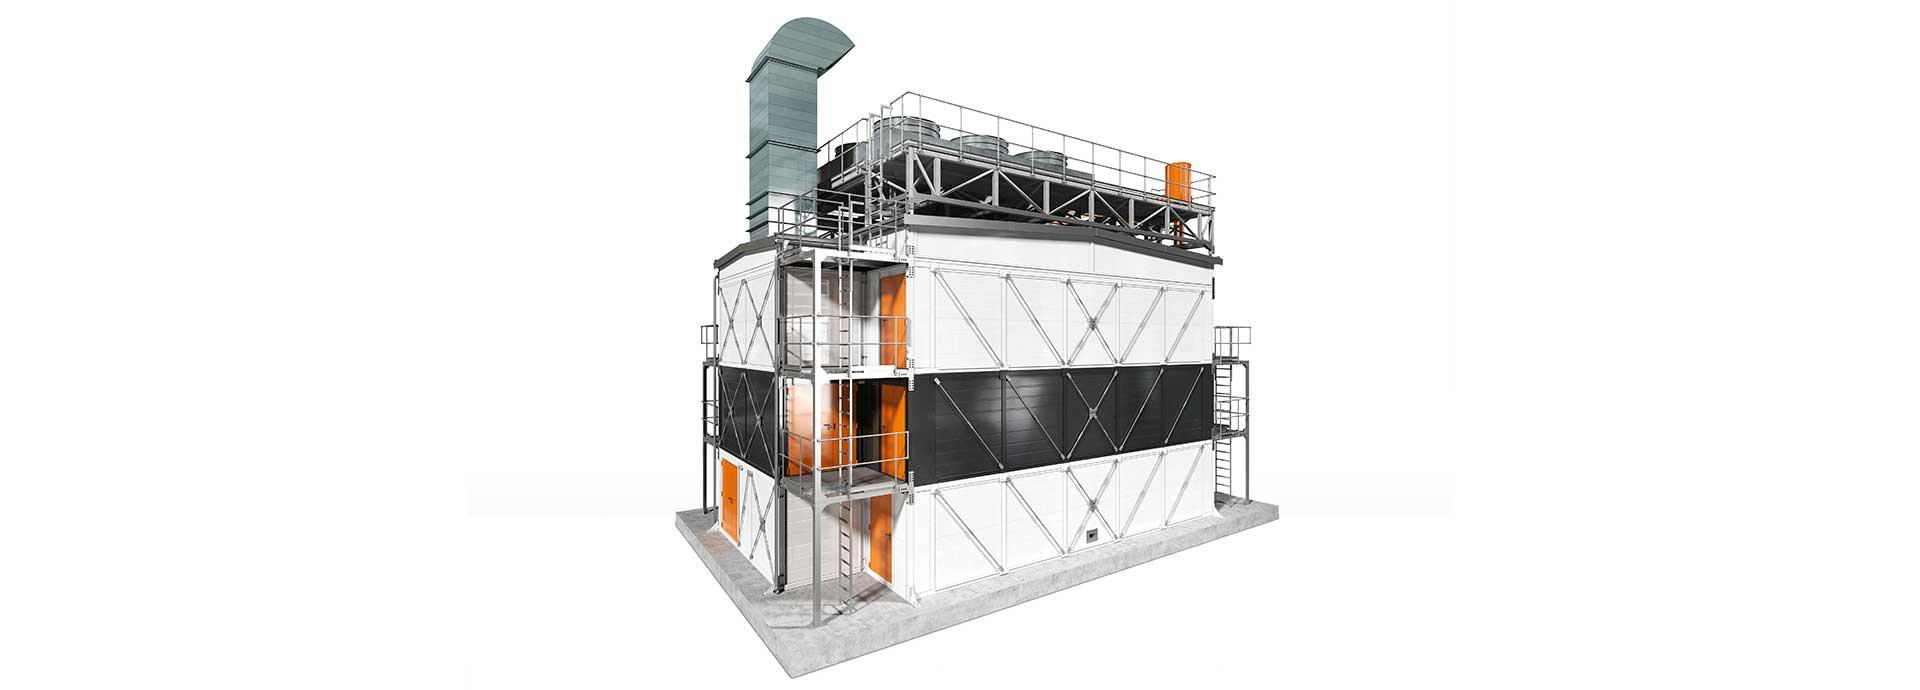 Towards higher efficiencies with Wärtsilä Modular Block